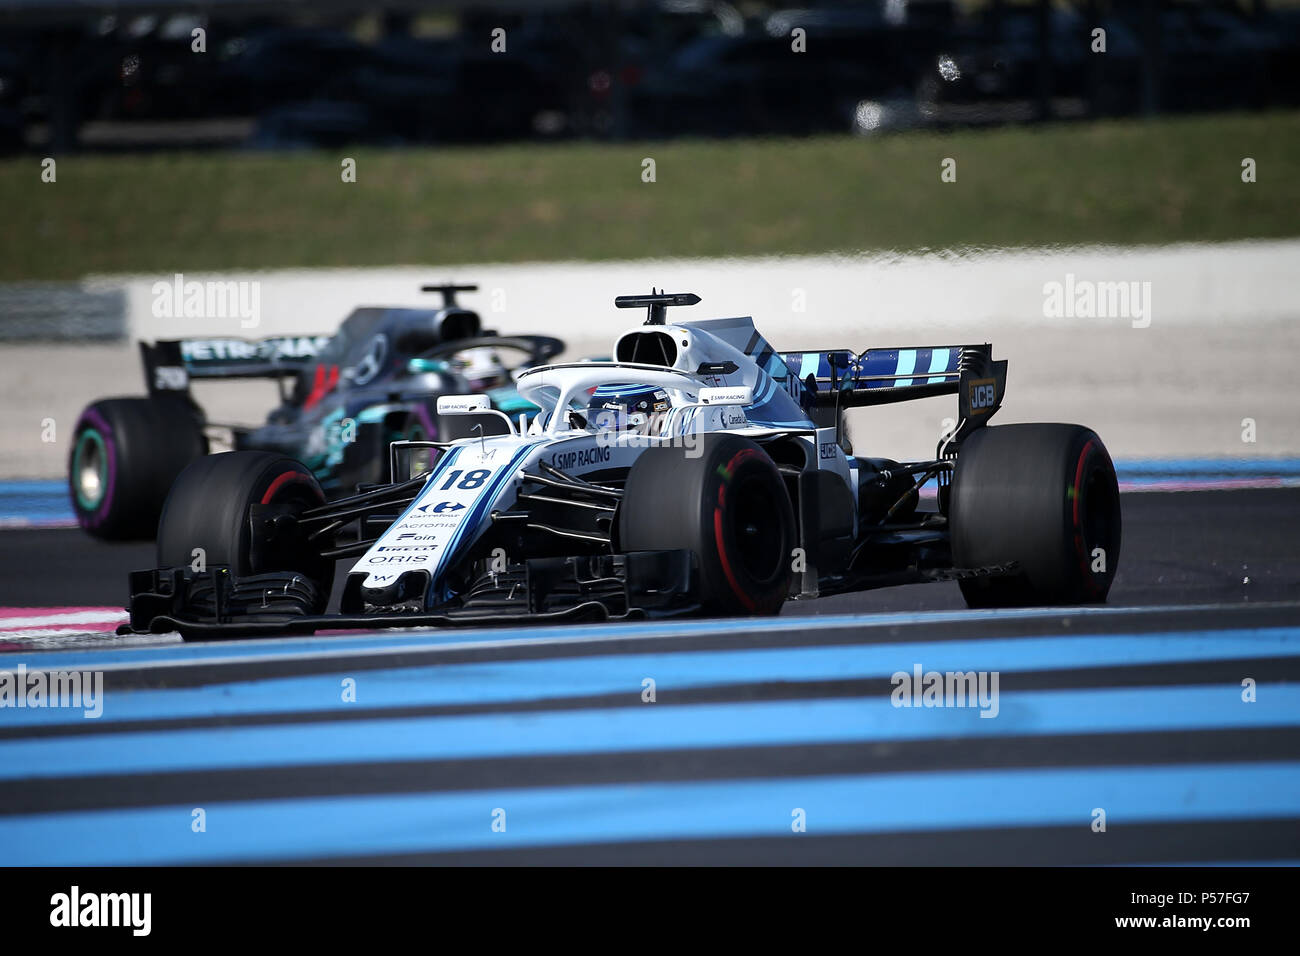 Bild rolf benz 240 Benz Dono 22062018 Circuit Paul Ricard Le Castellet Formula Pirelli Grand Prix Alamy Motor Racing Lewis Hamilton Photo Stock Photos Motor Racing Lewis